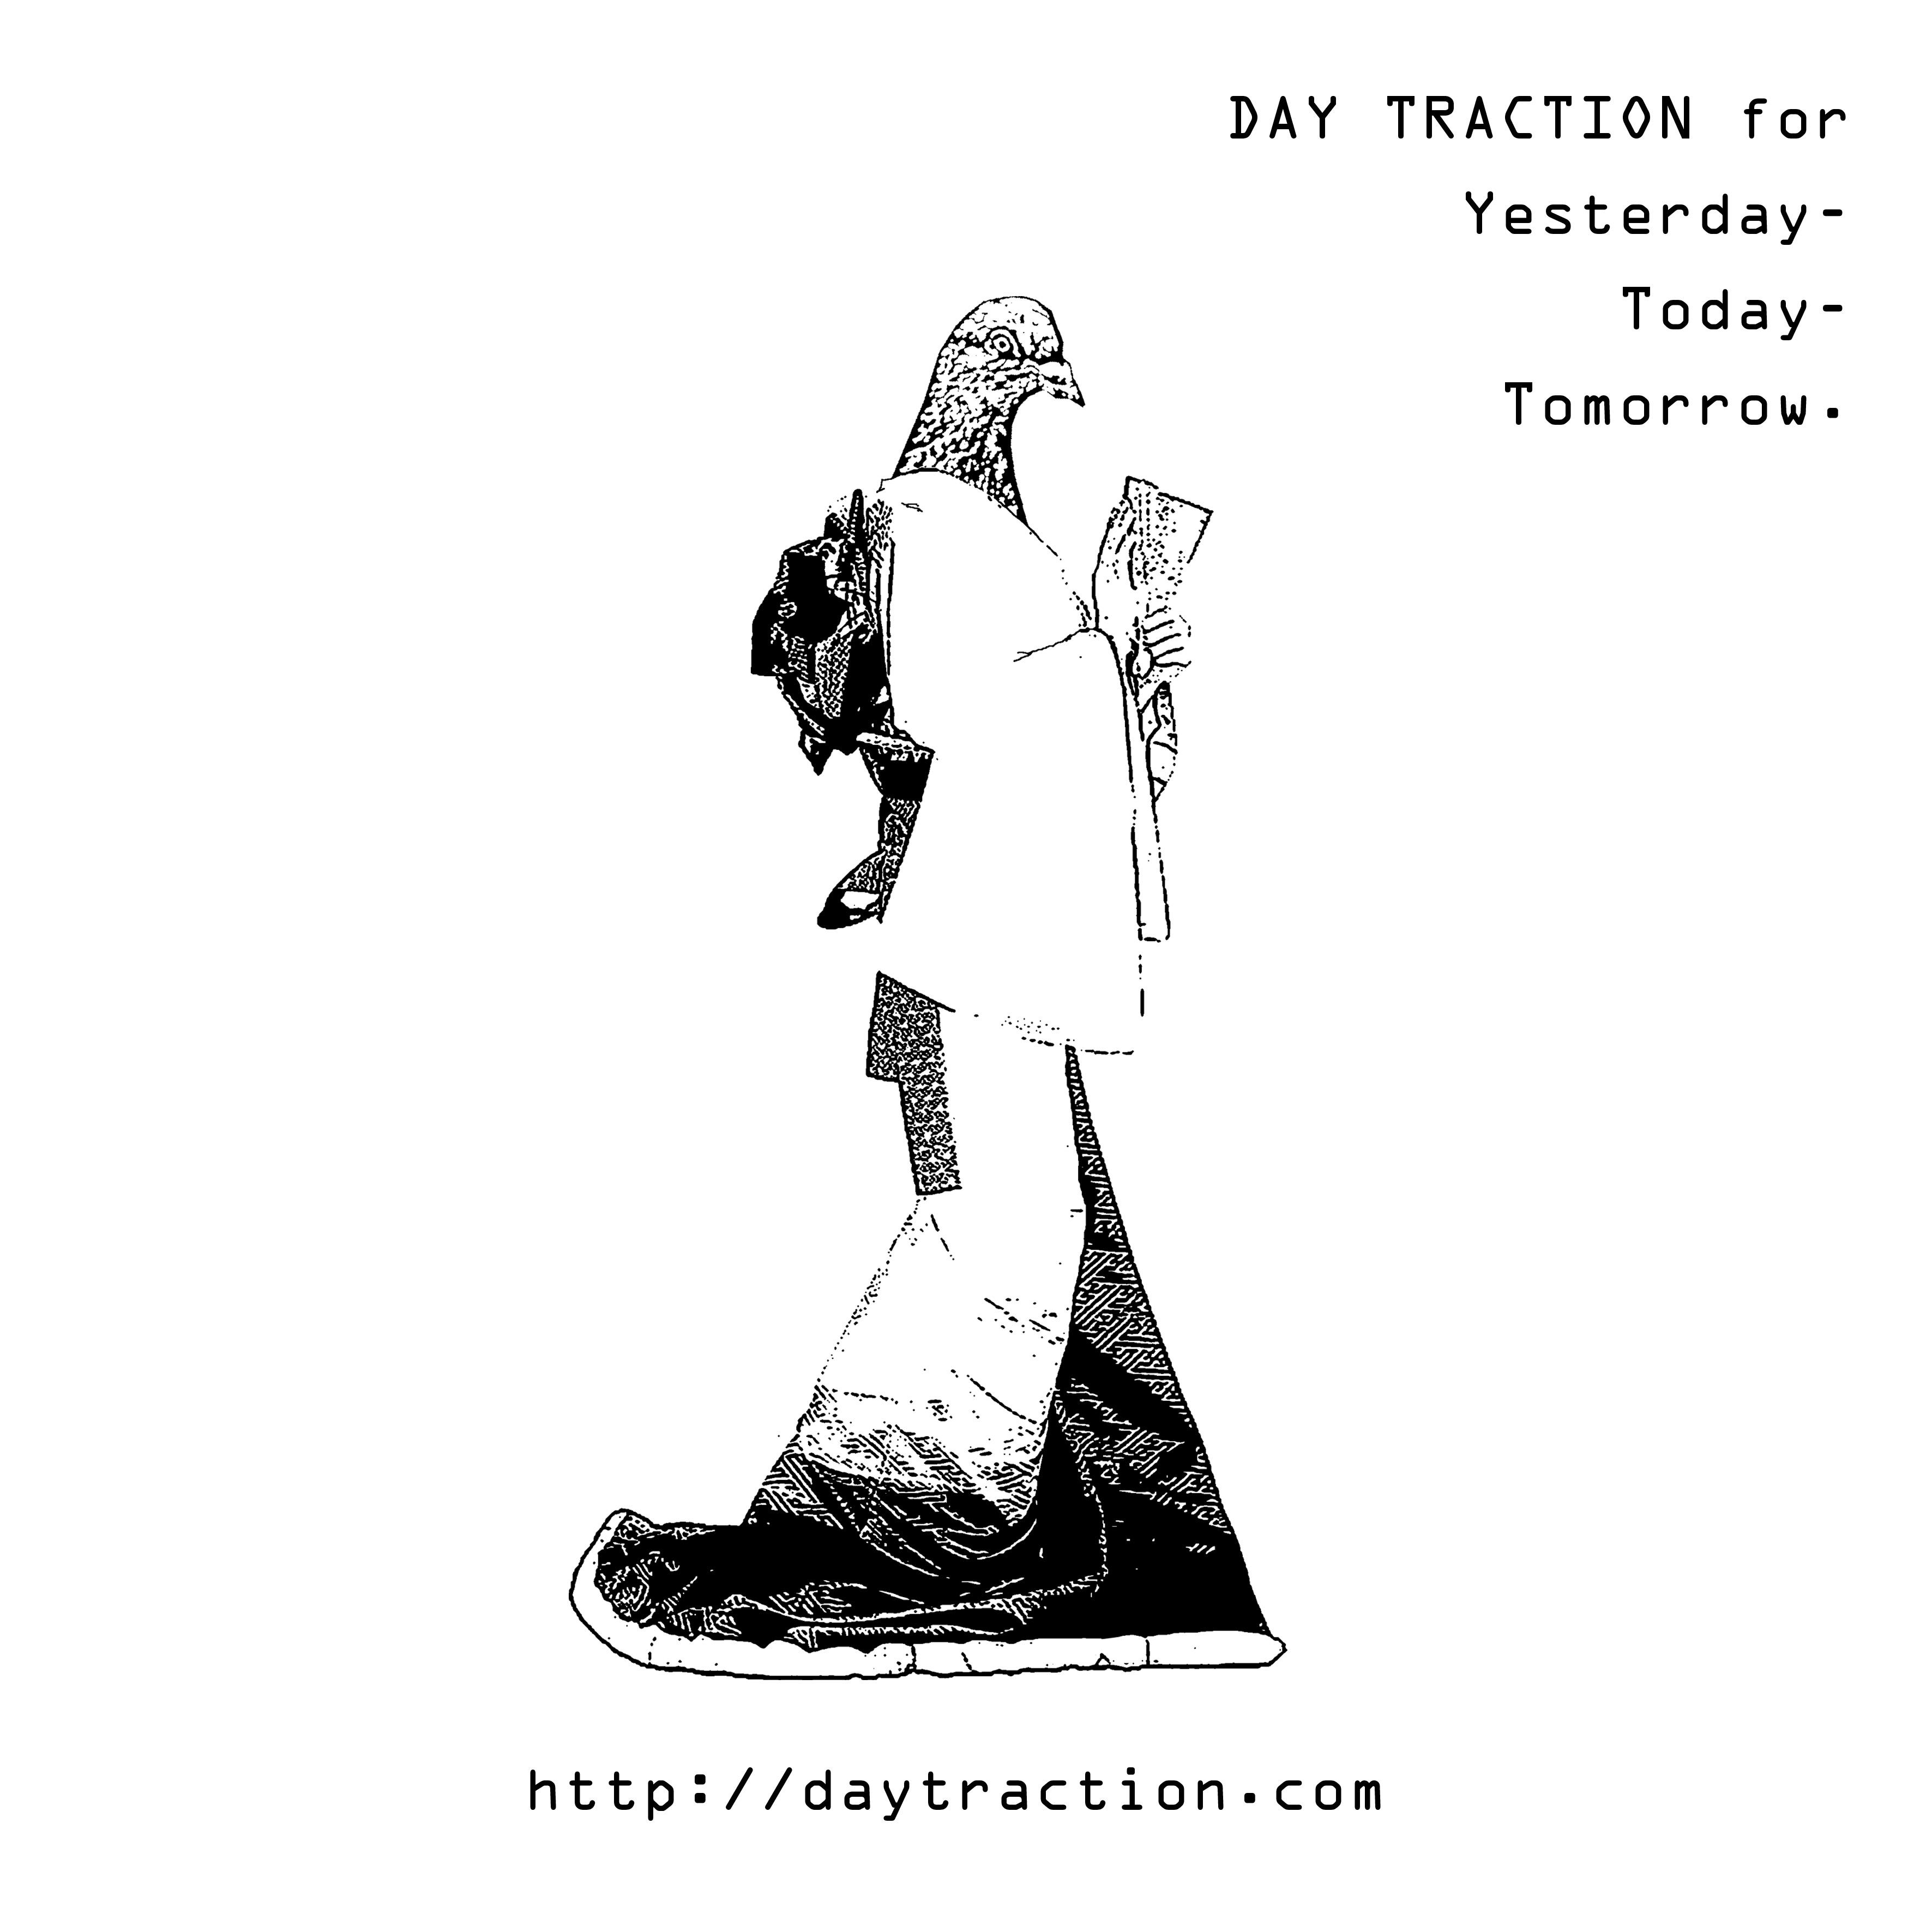 Yesterday-Today-Tomorrow